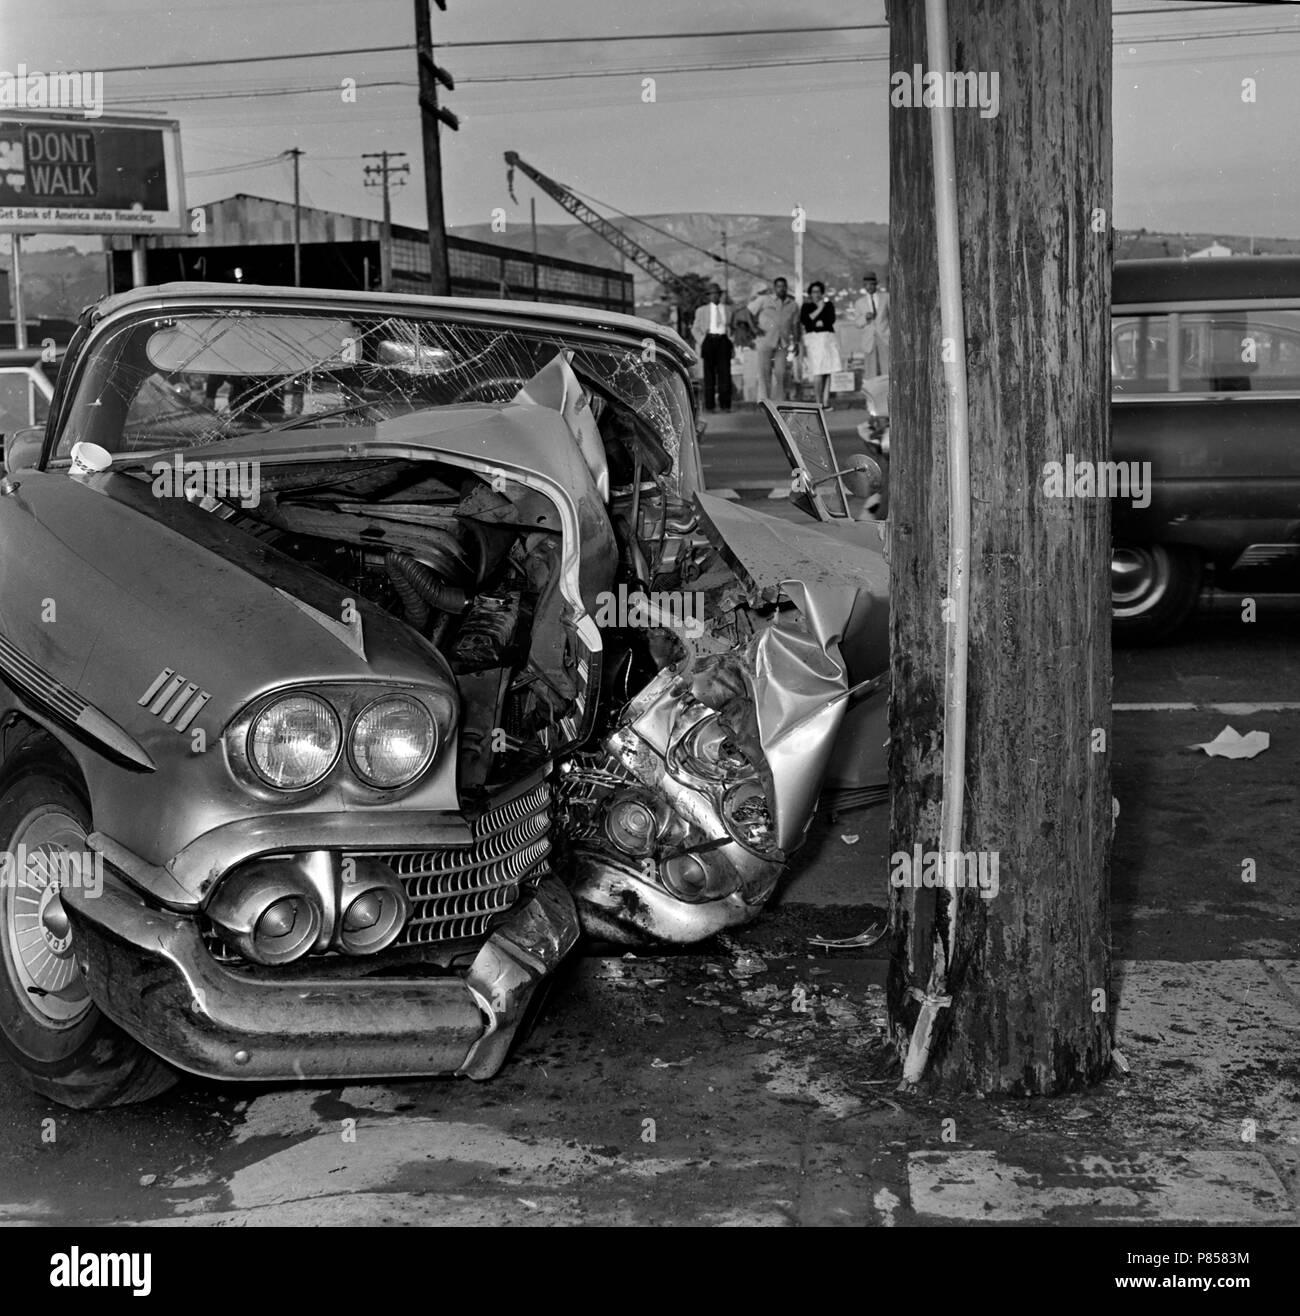 Telephone pole vs car accident in California, ca. 1963. - Stock Image